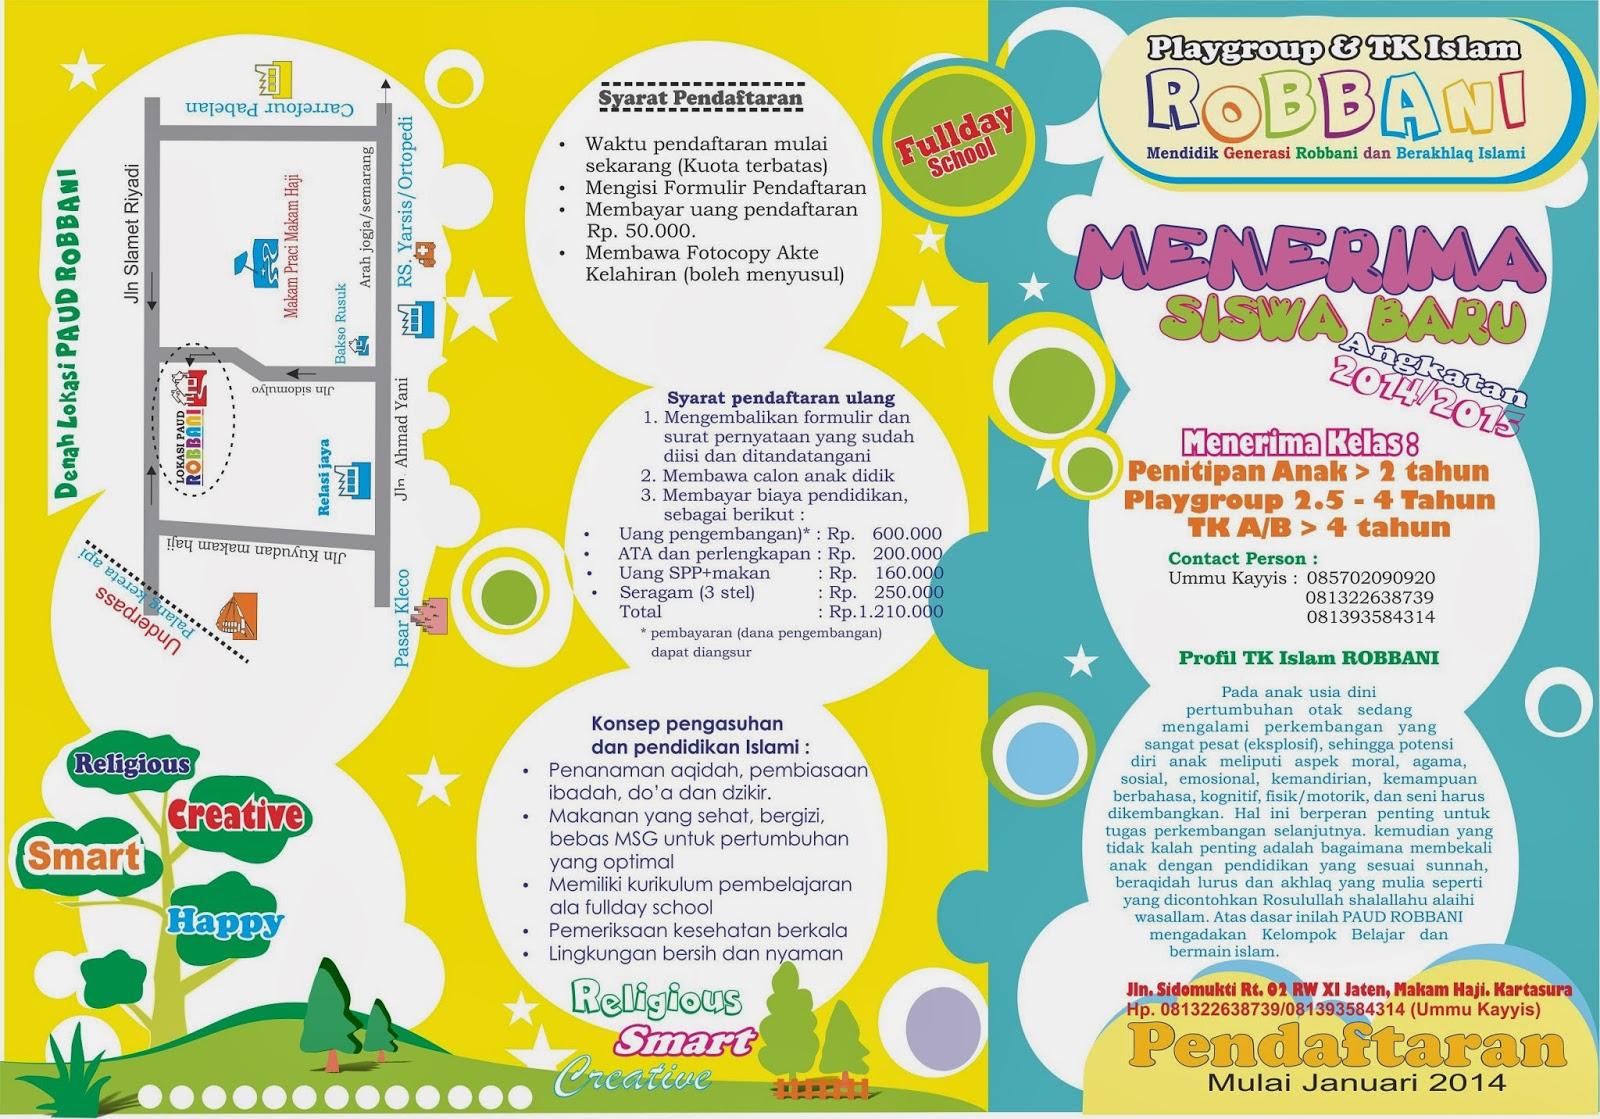 Brosur Paud Robbani 2014 2015 Playgroup Dan Tk Islam Robbani